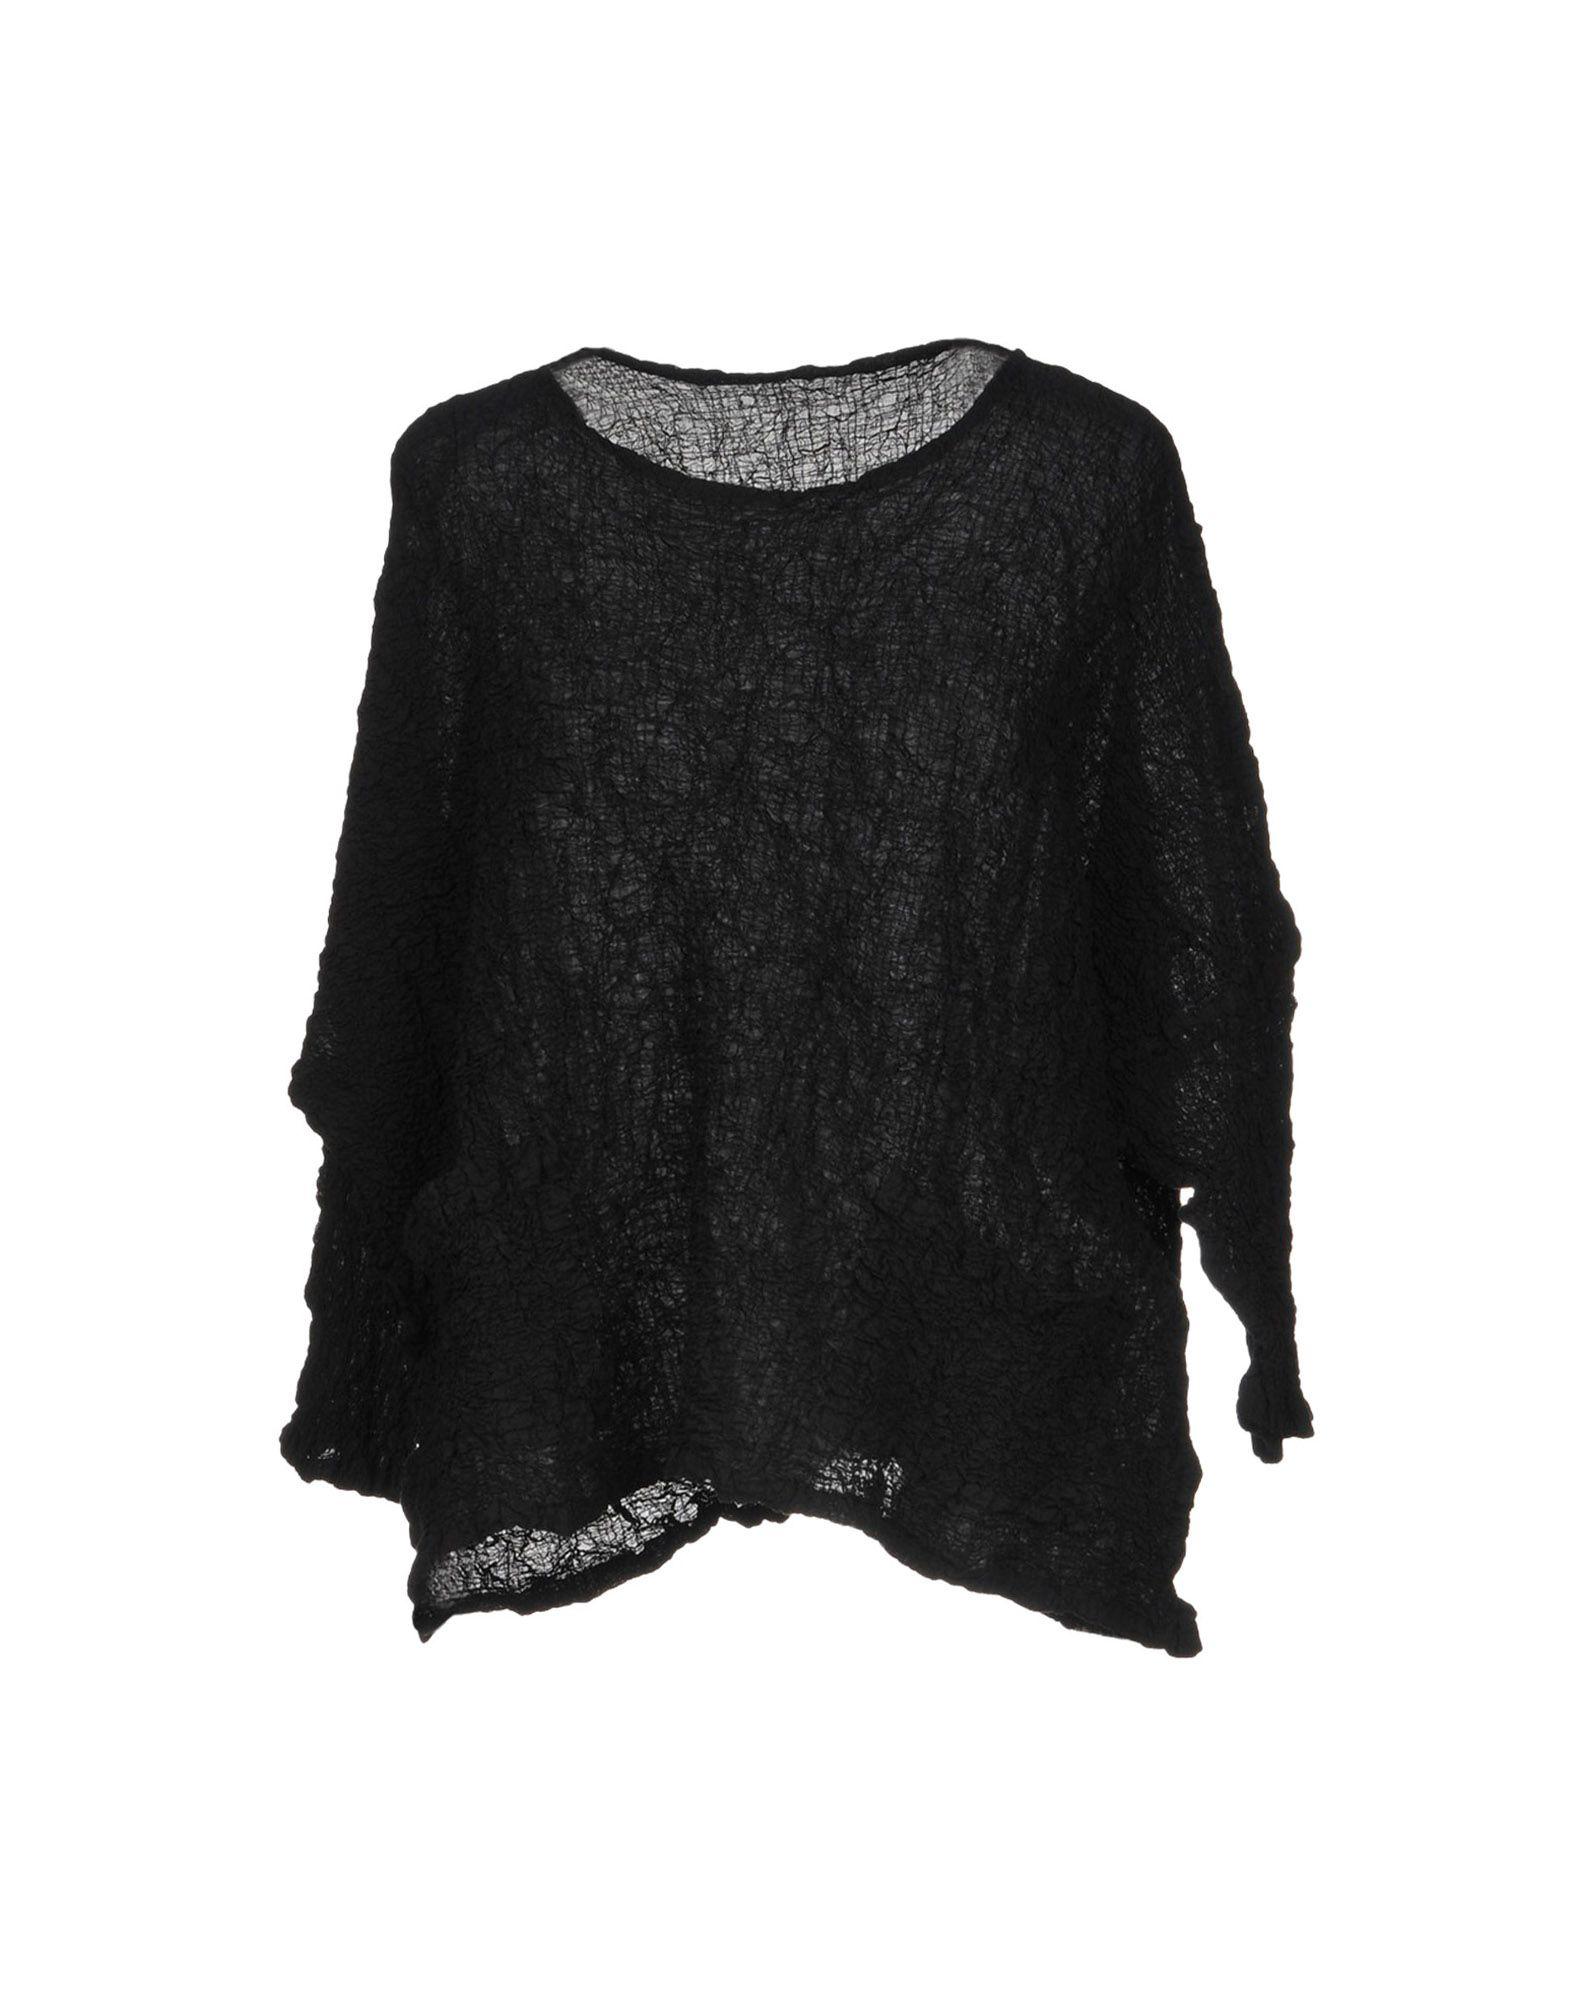 ISSEY MIYAKE CAULIFLOWER Blouses in Black